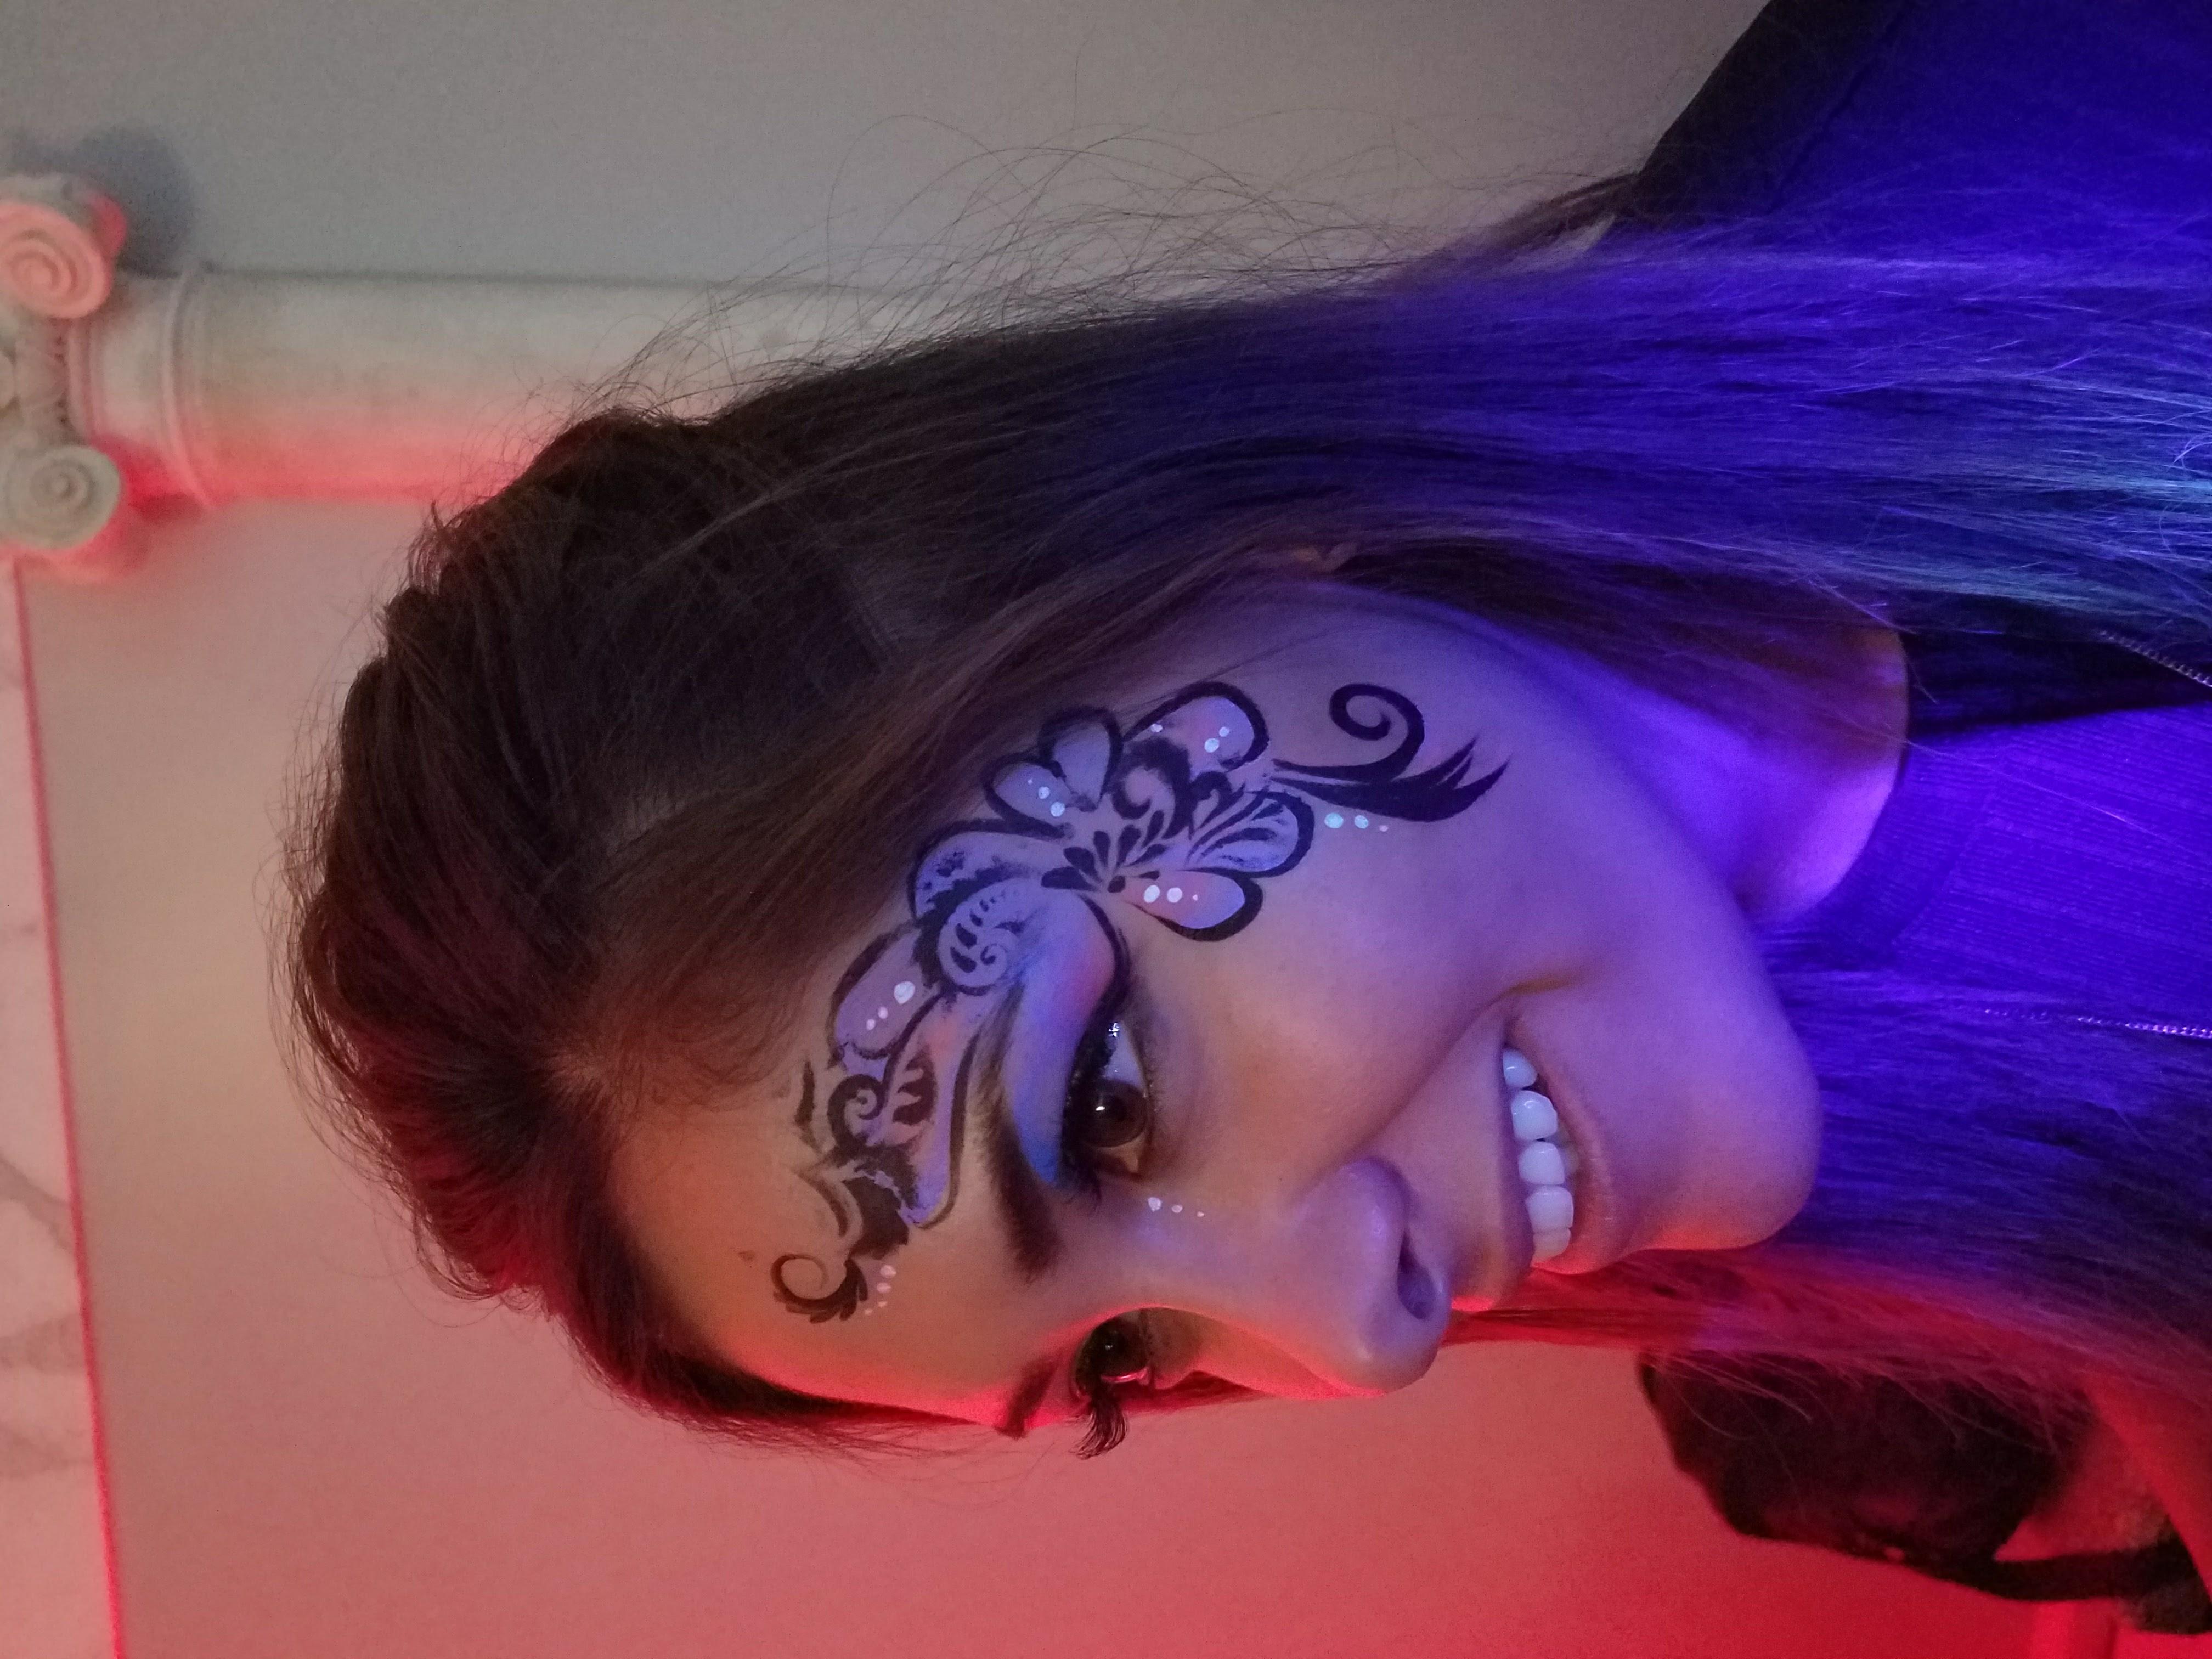 UV floral (under normal lighting)